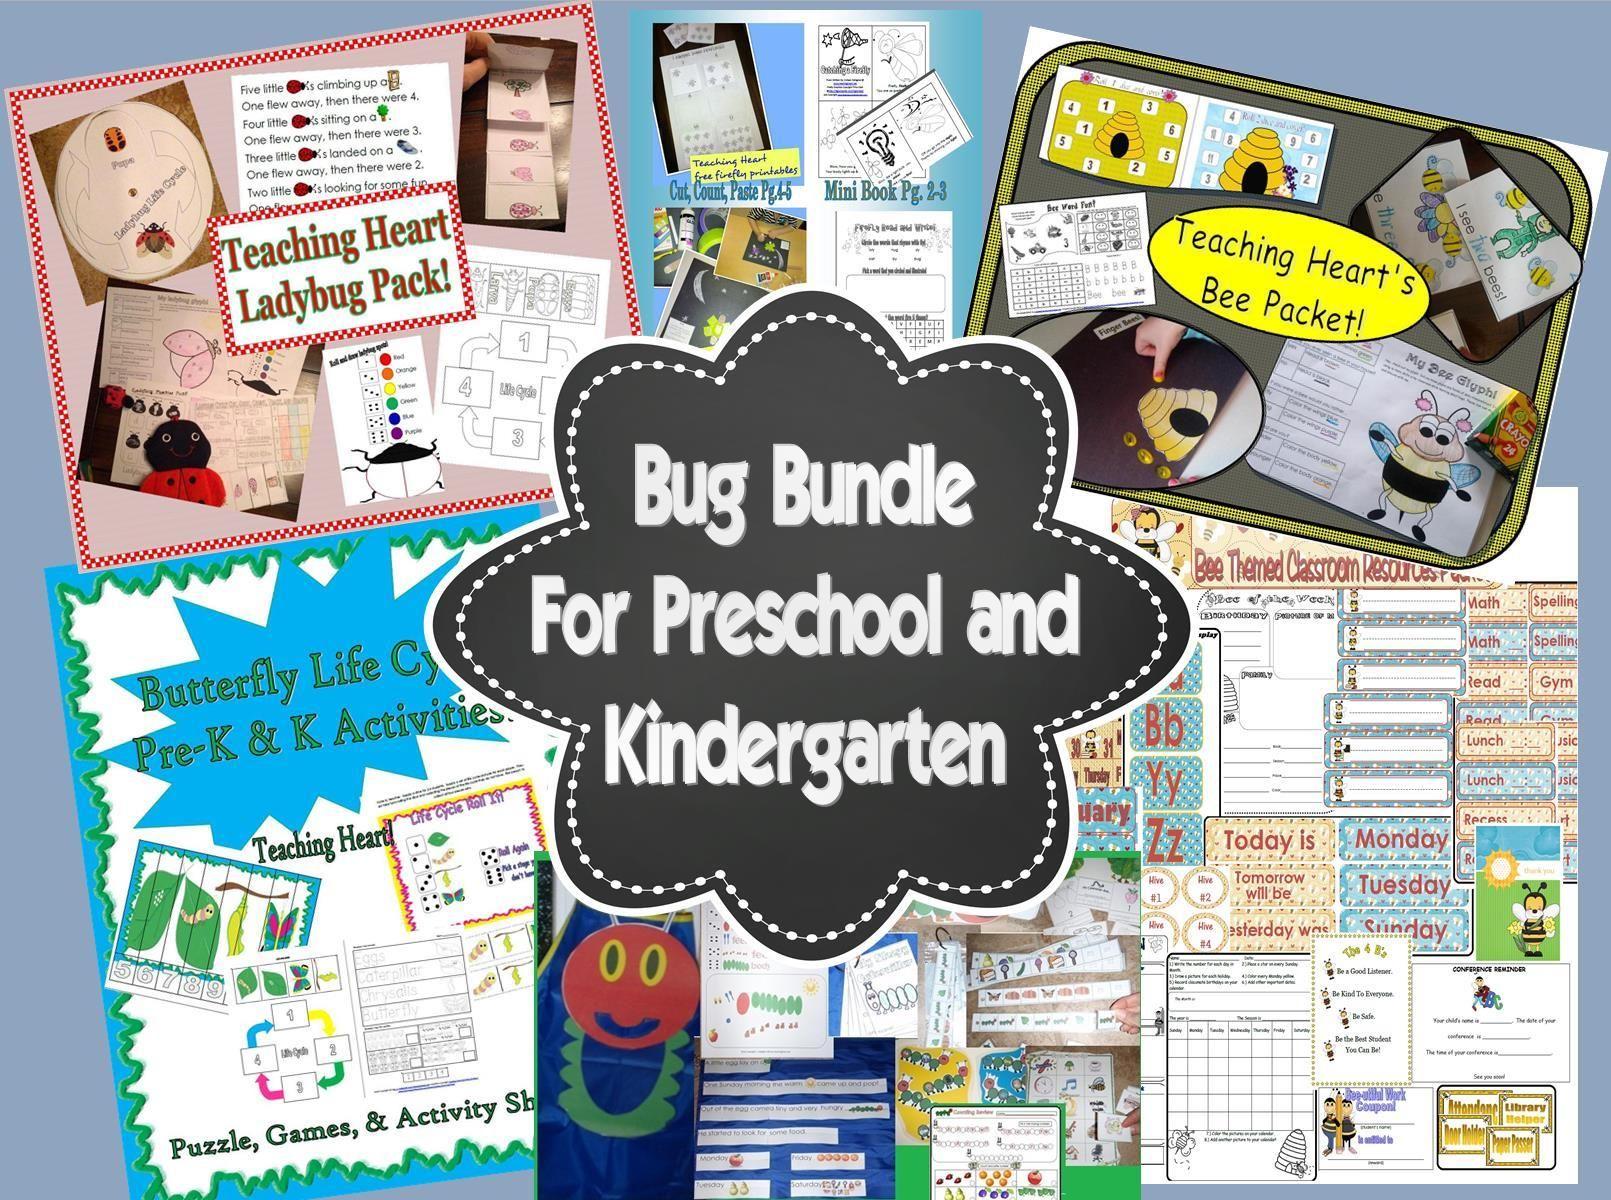 Bugbundle 1 611 1 200 Pixels With Images